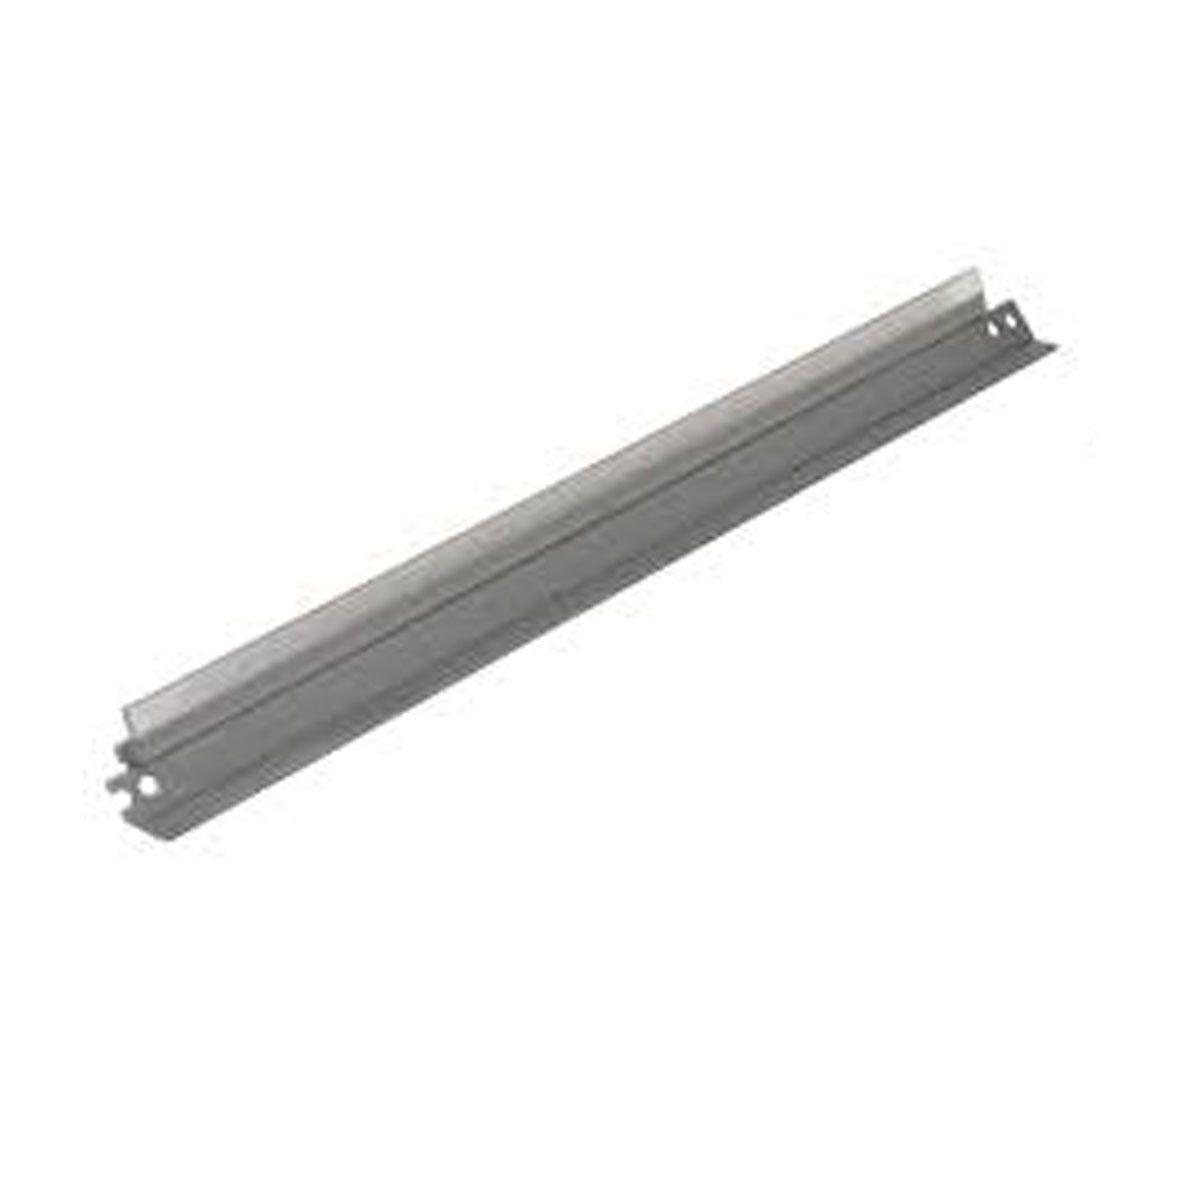 Lamina Limpeza Wiper Blade Samsung D104S D104 104 - ML1665 ML1660 SCX3200 SCX3217